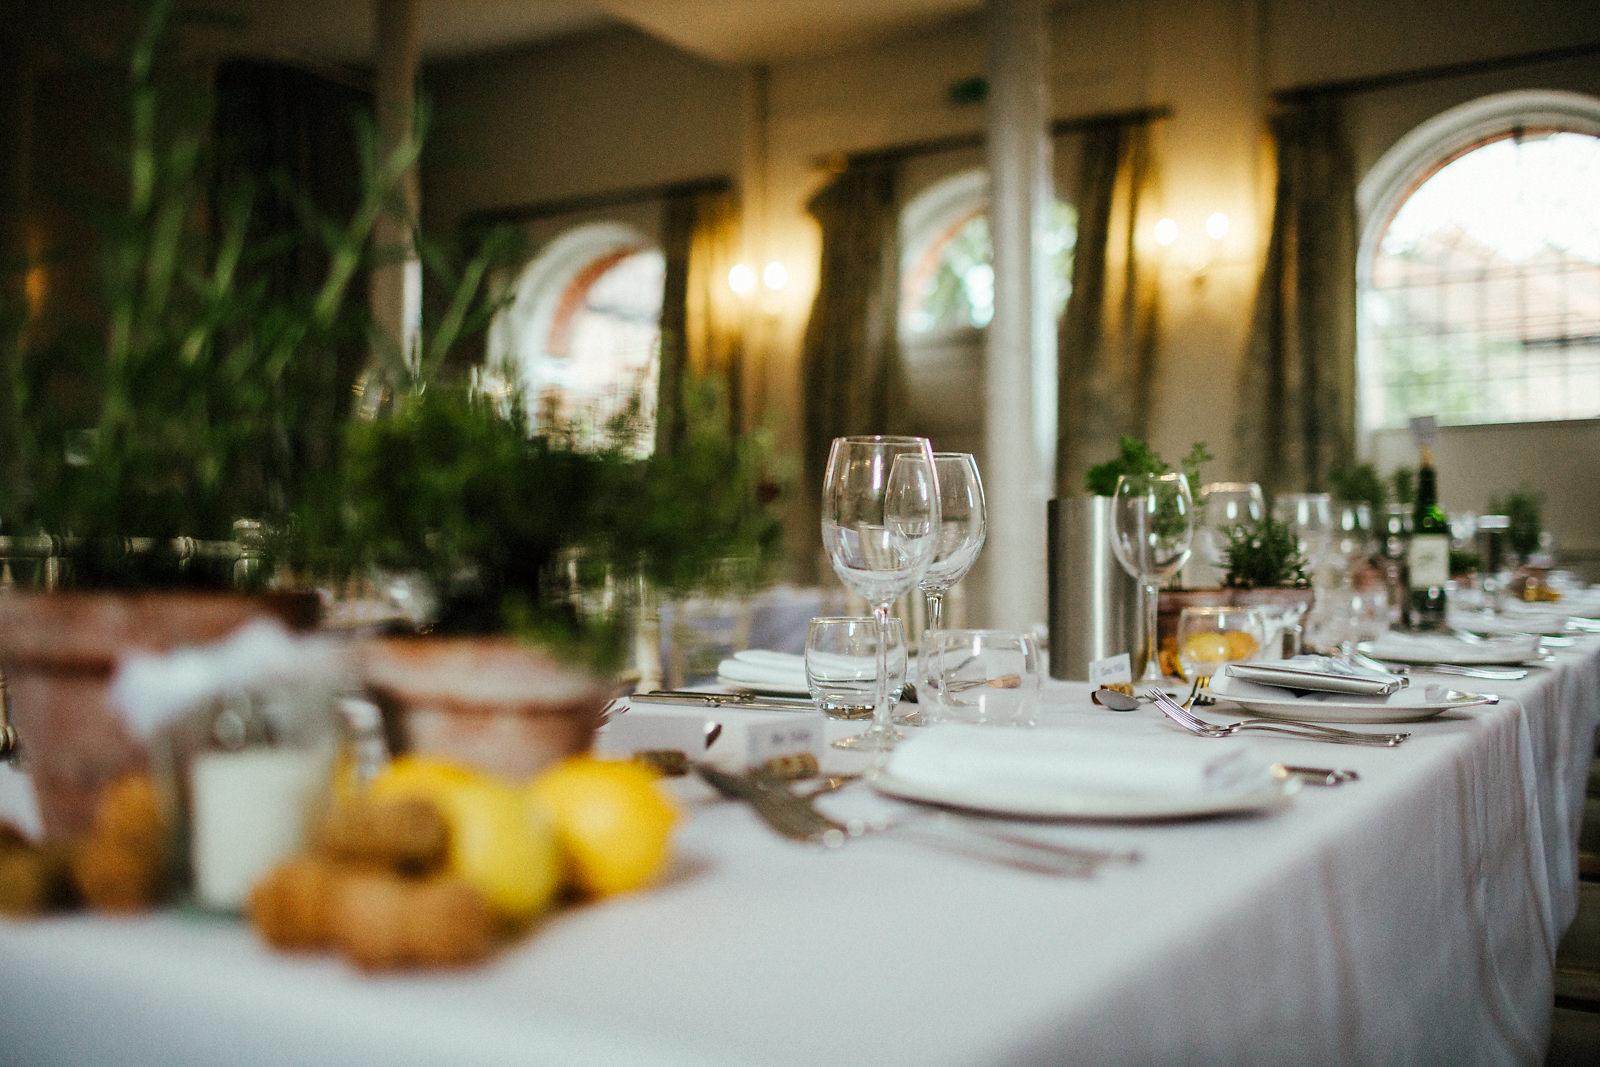 Italian style wedding table decorations